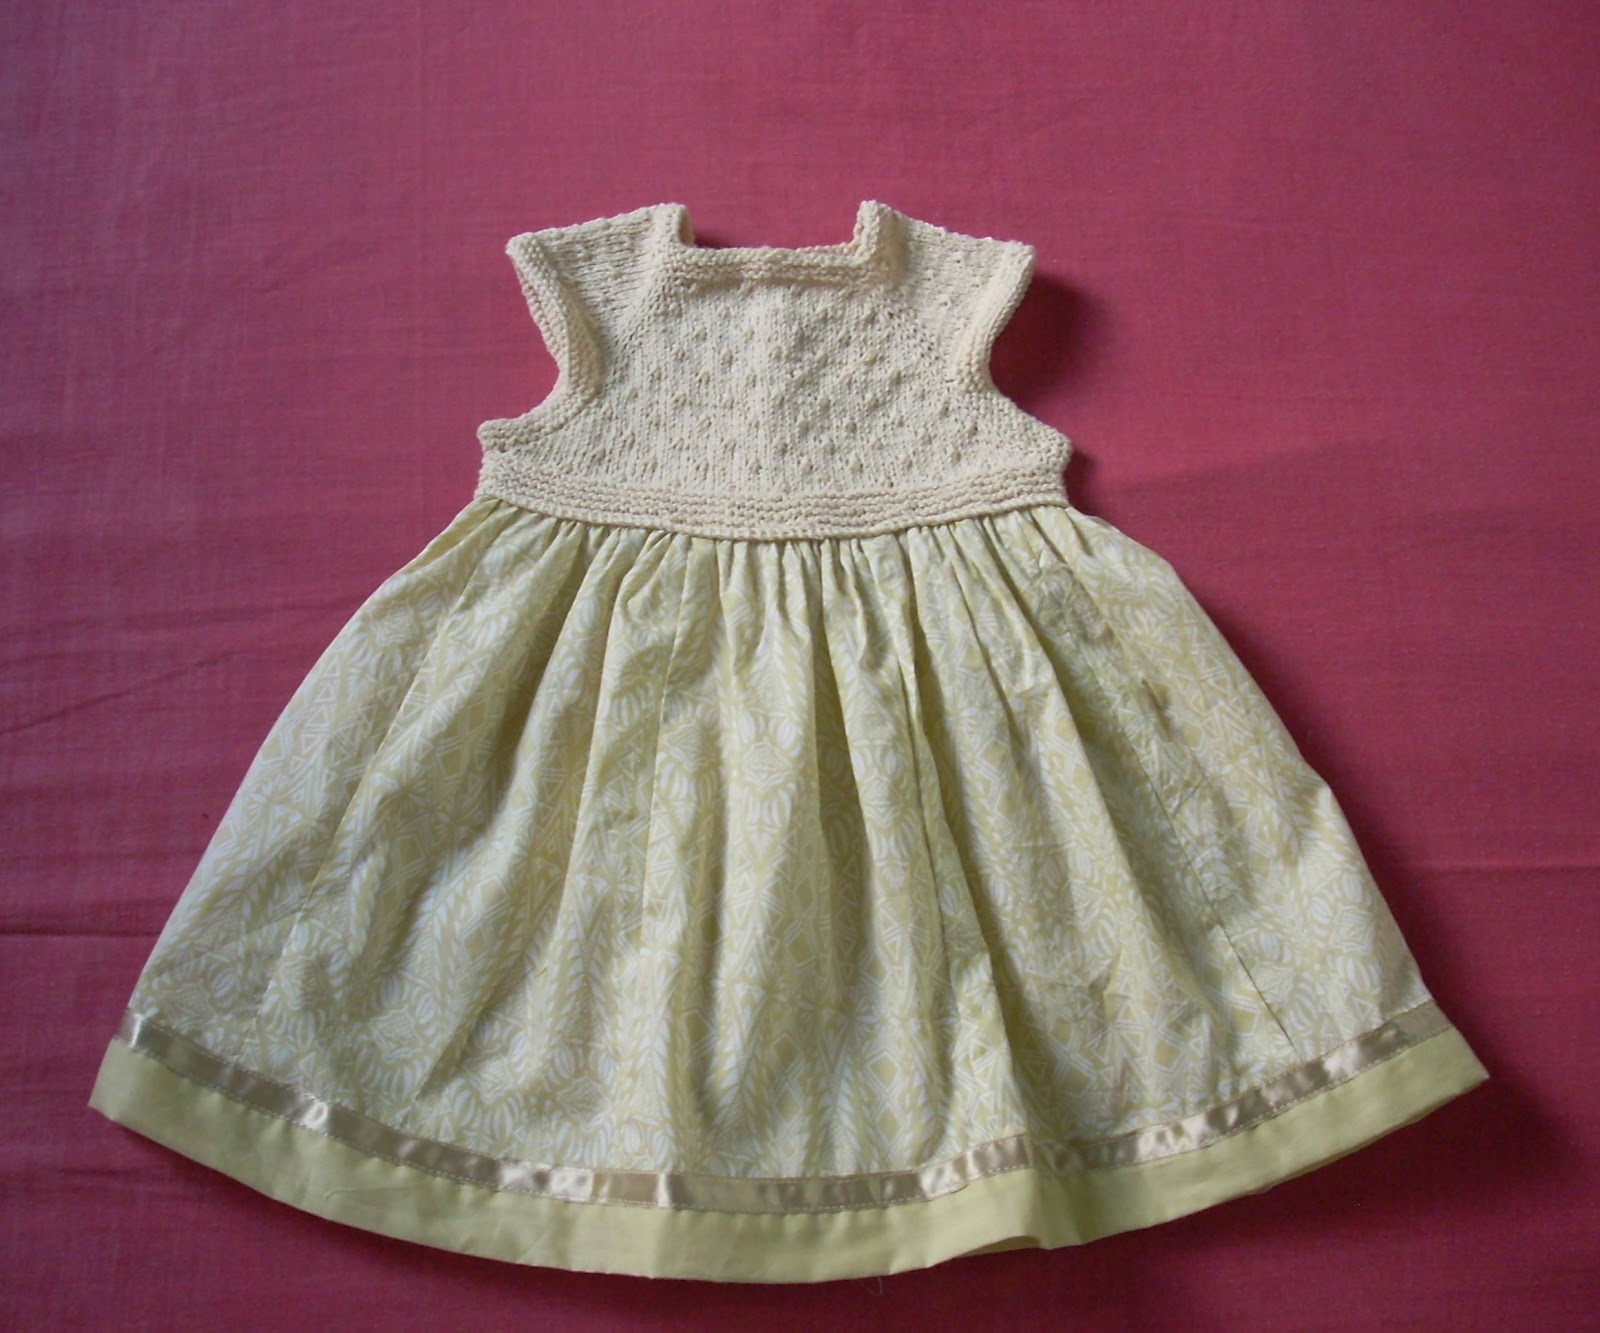 Umme Yusuf Baby Dress with Knitted Yoke